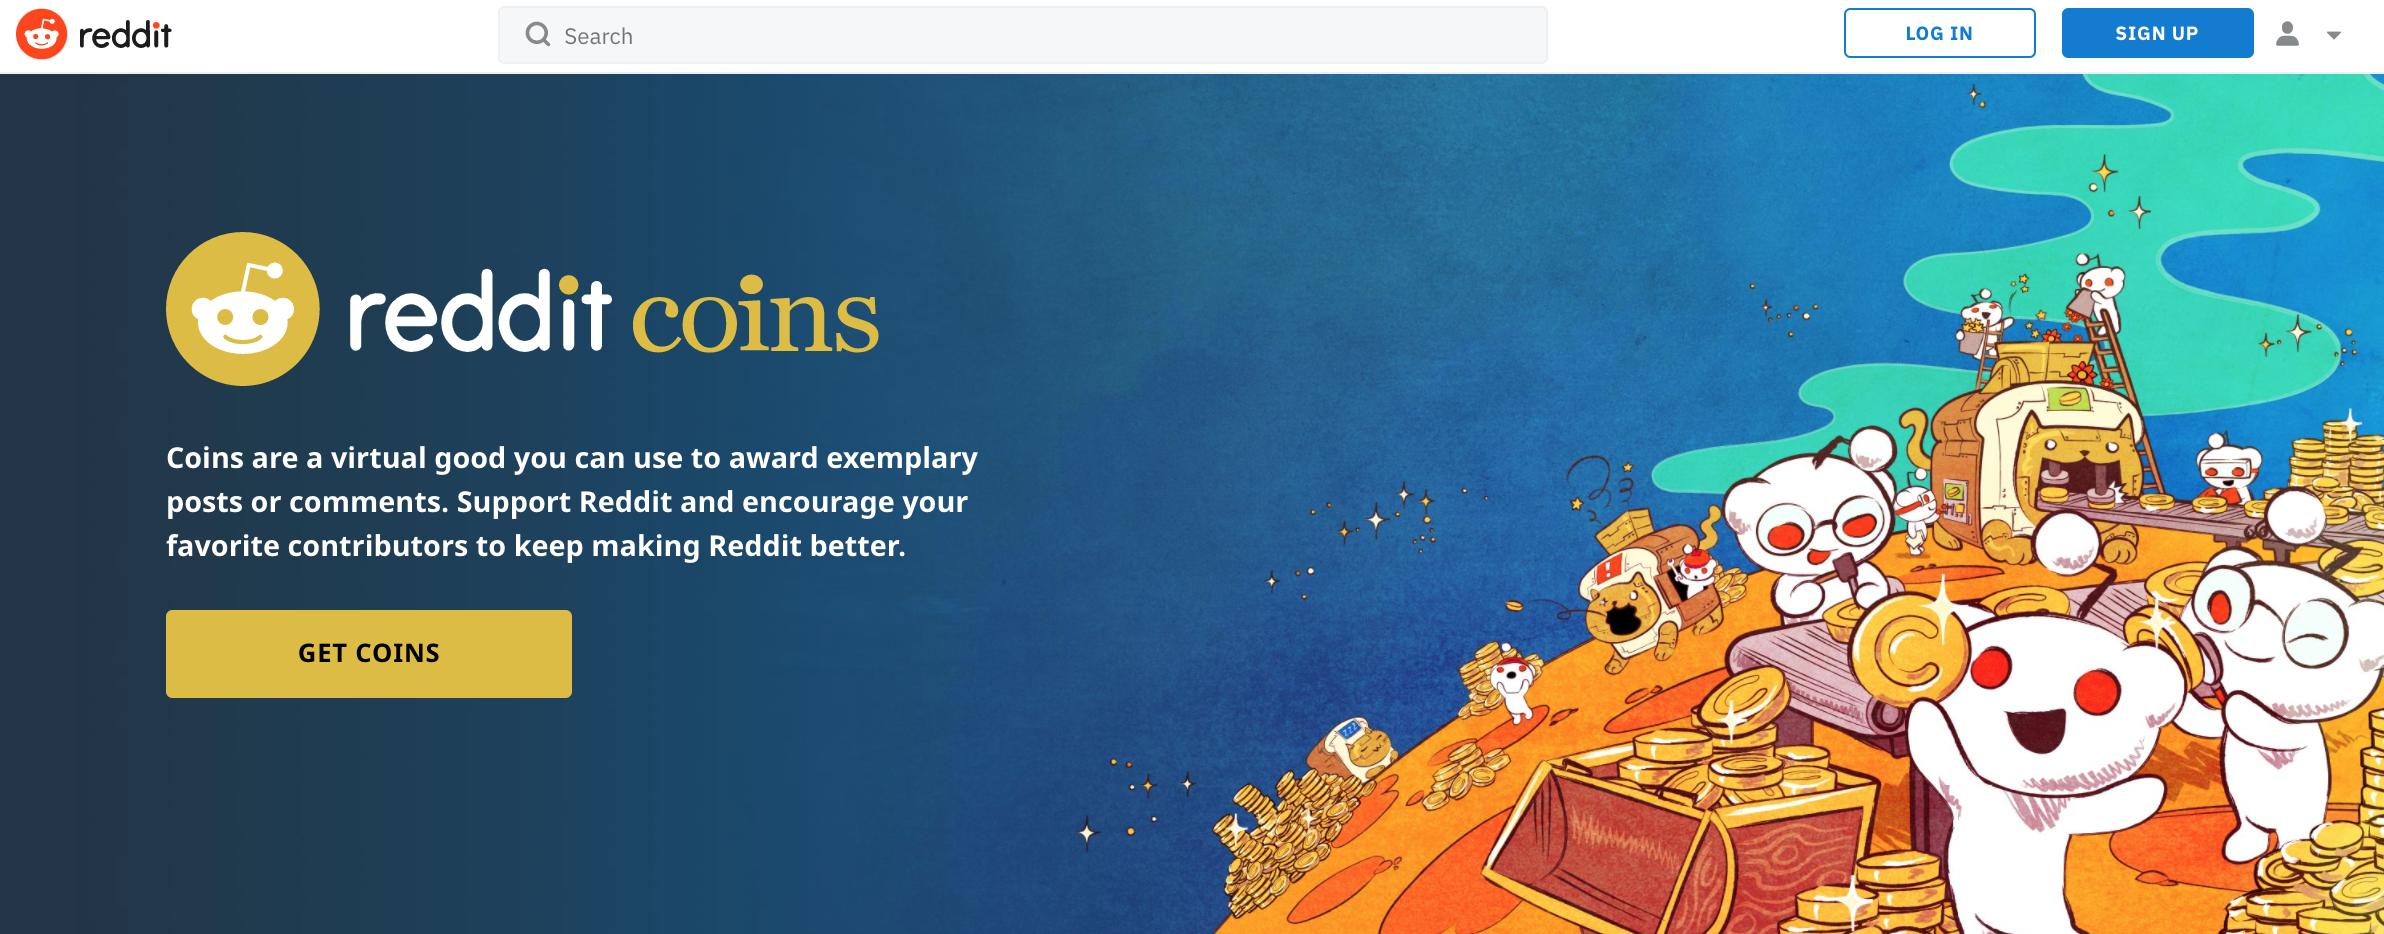 que es reddit coins gold